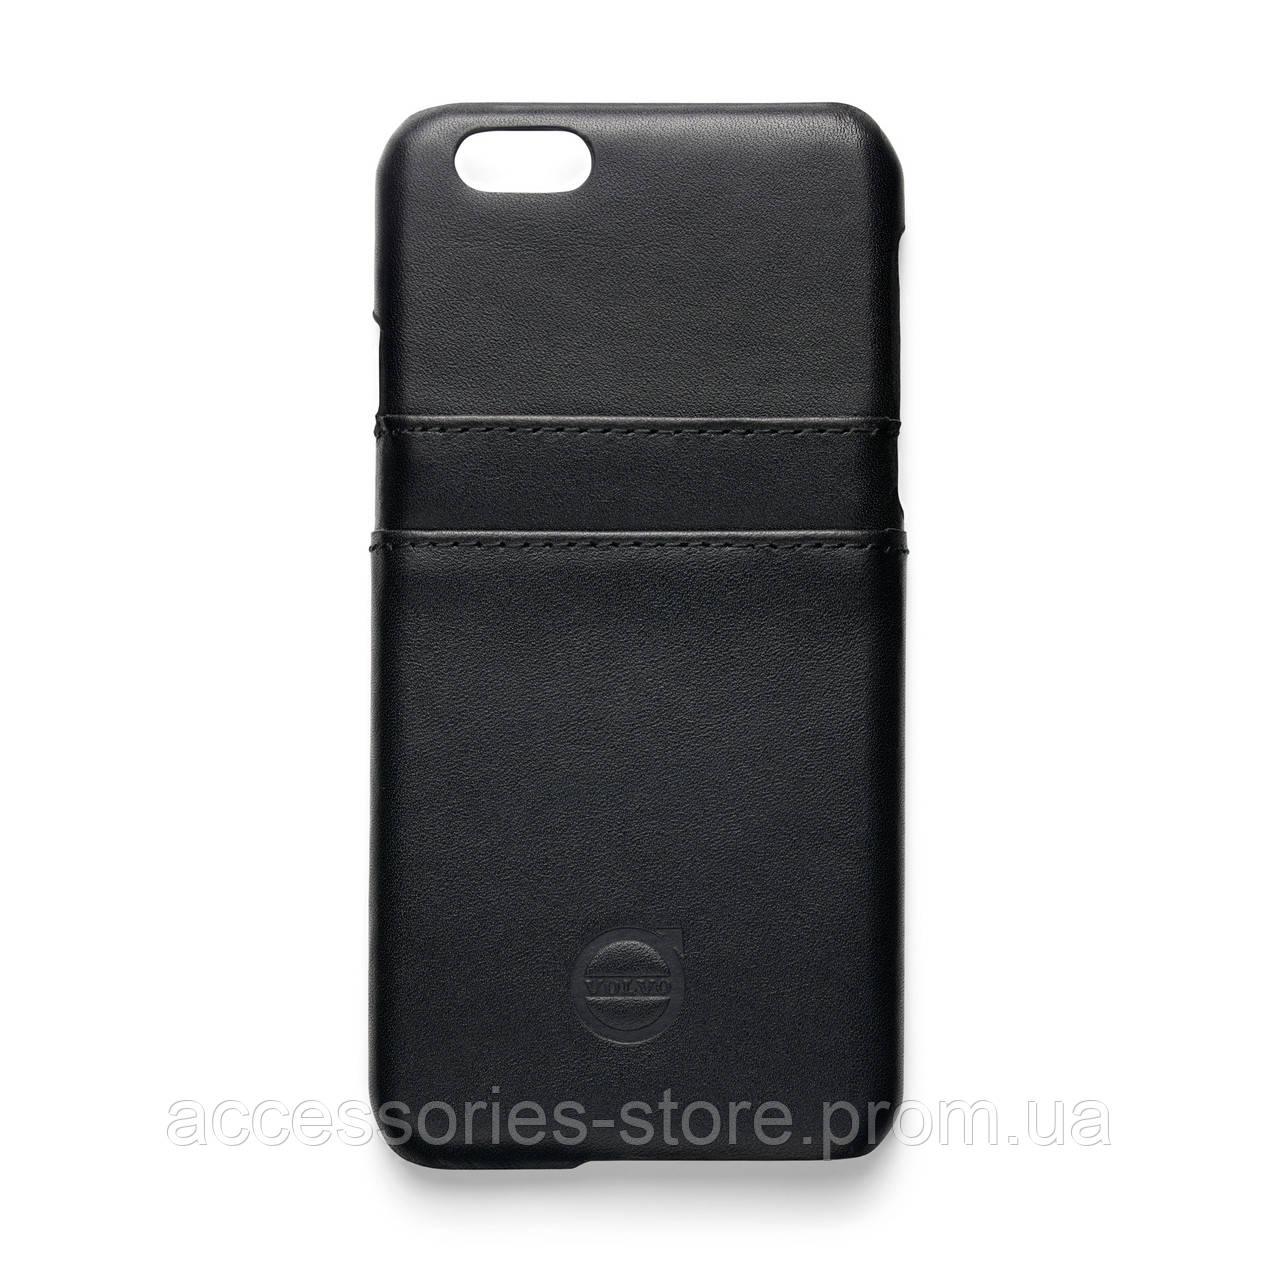 Чехол кожаный Volvo Leather iPhone 6 case